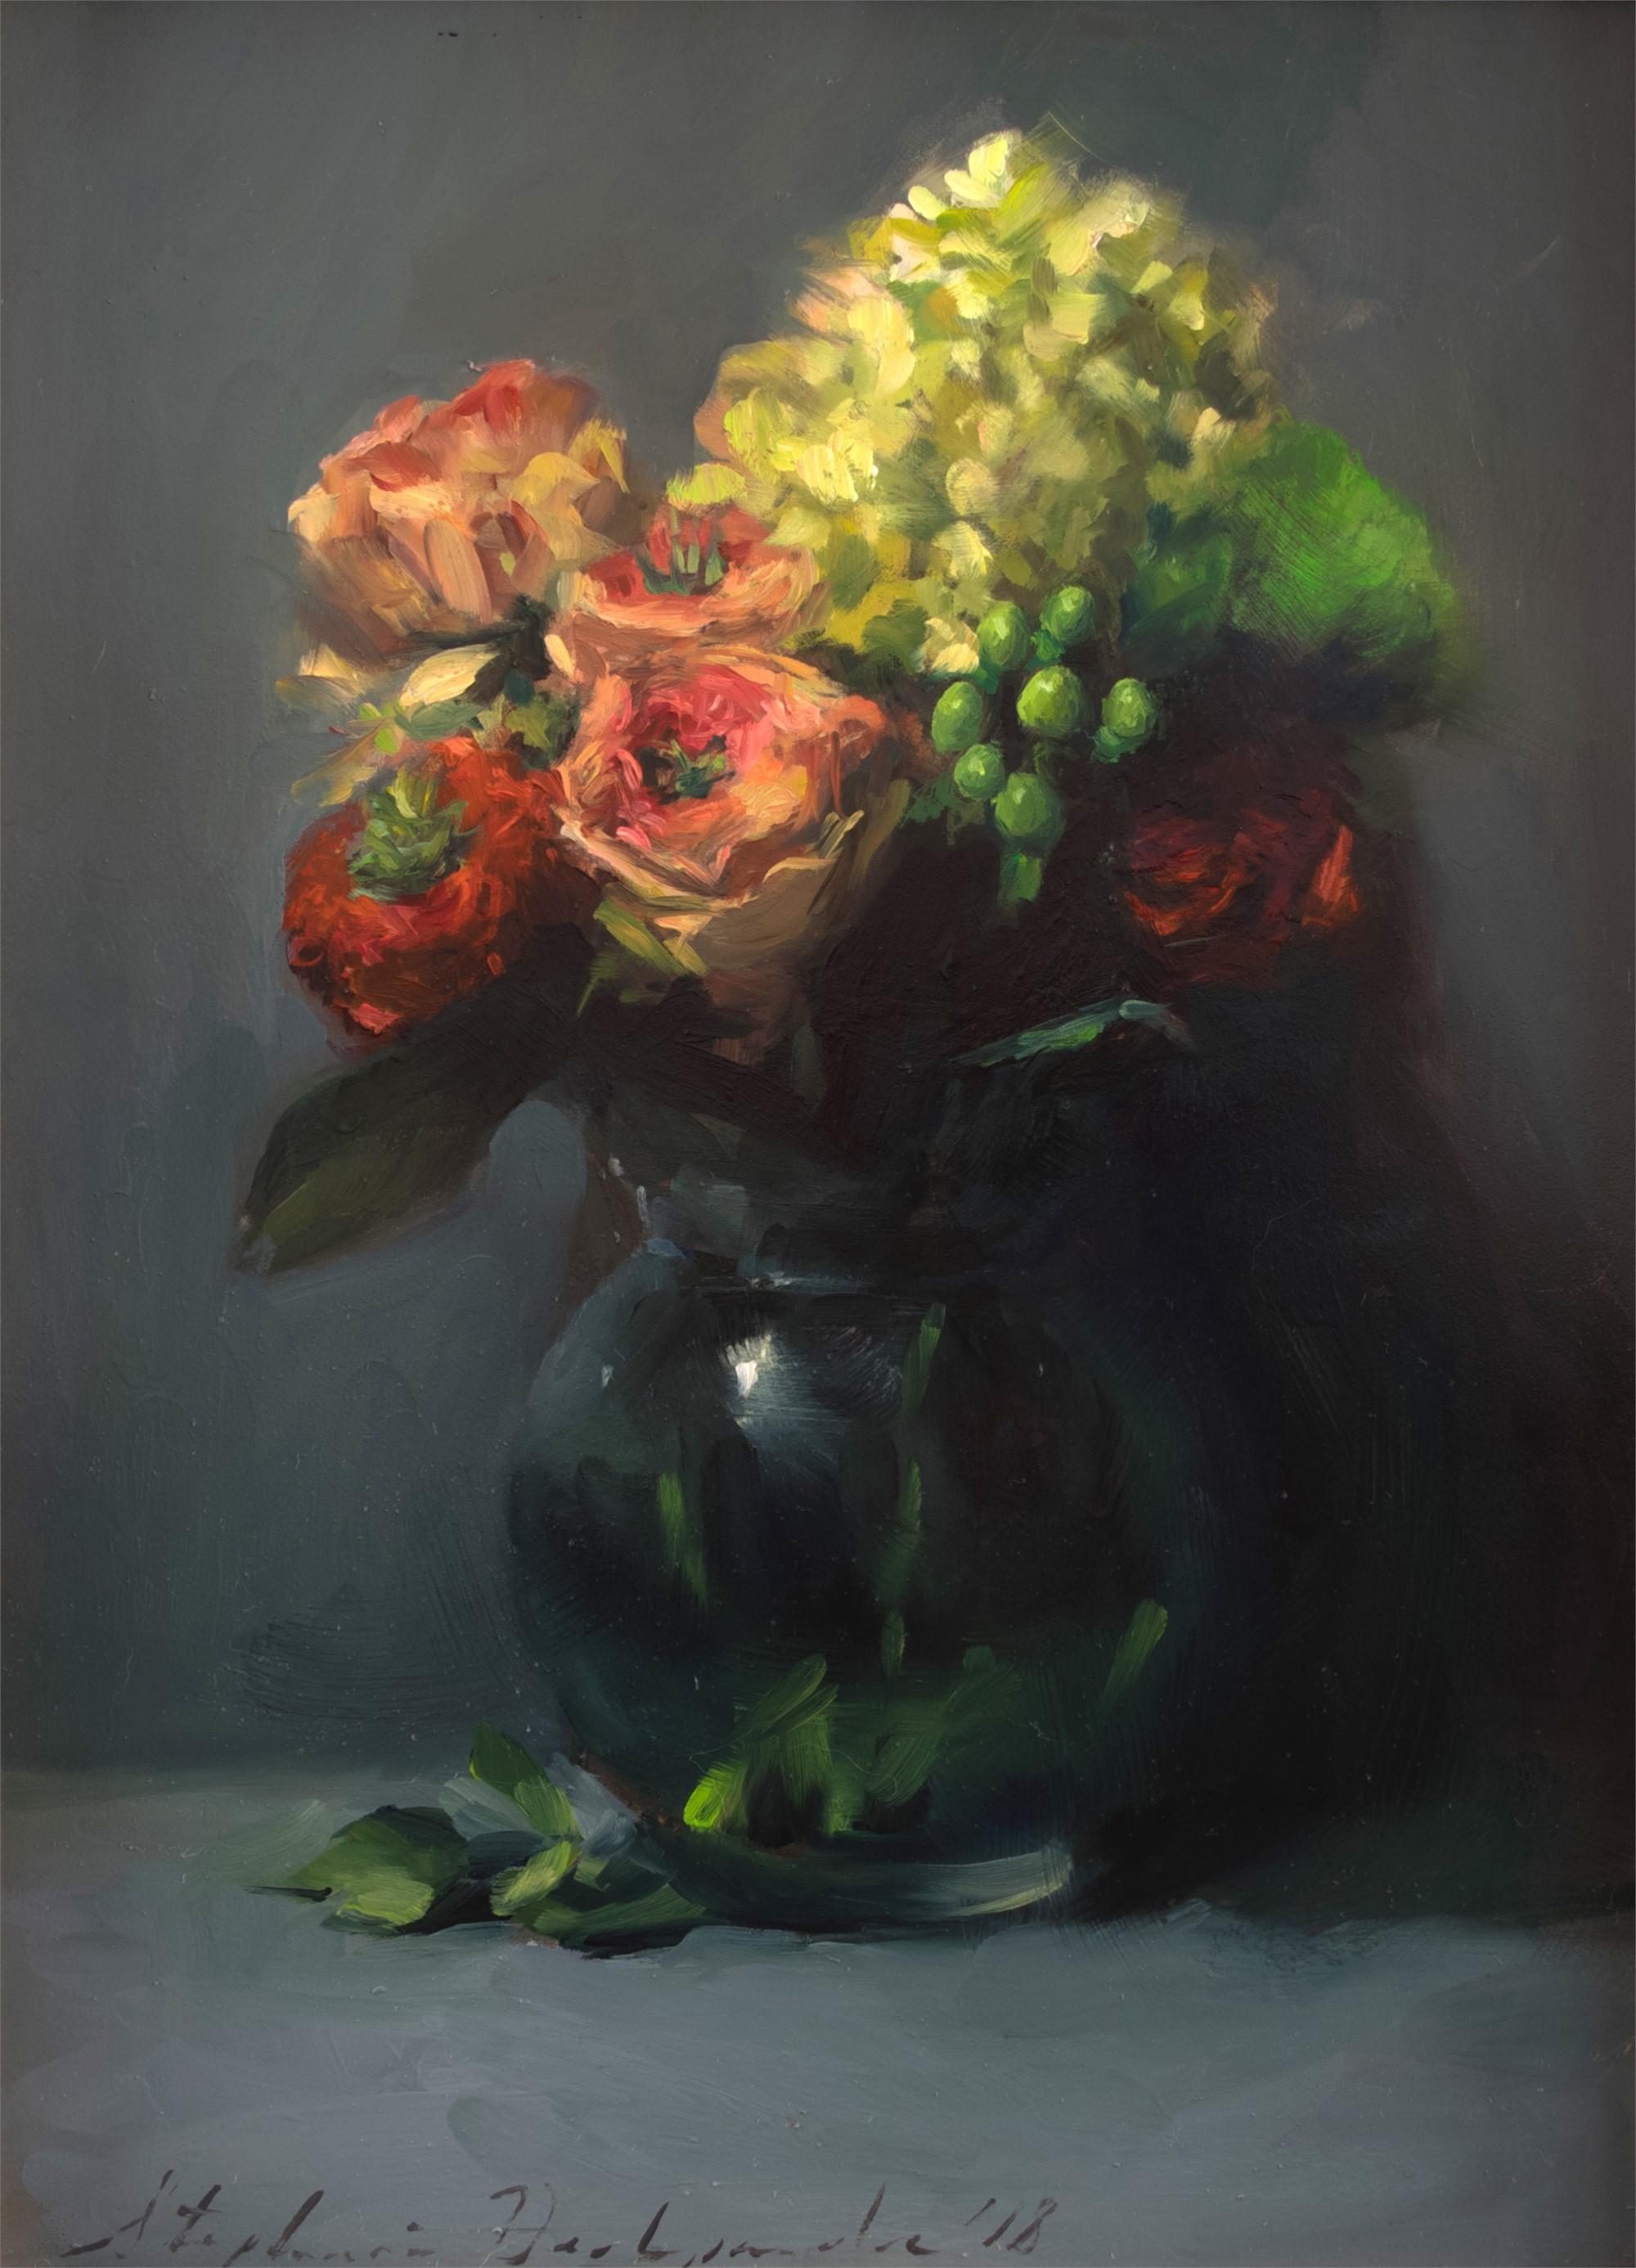 Grassy Eye Bouquet by Stephanie Deshpande